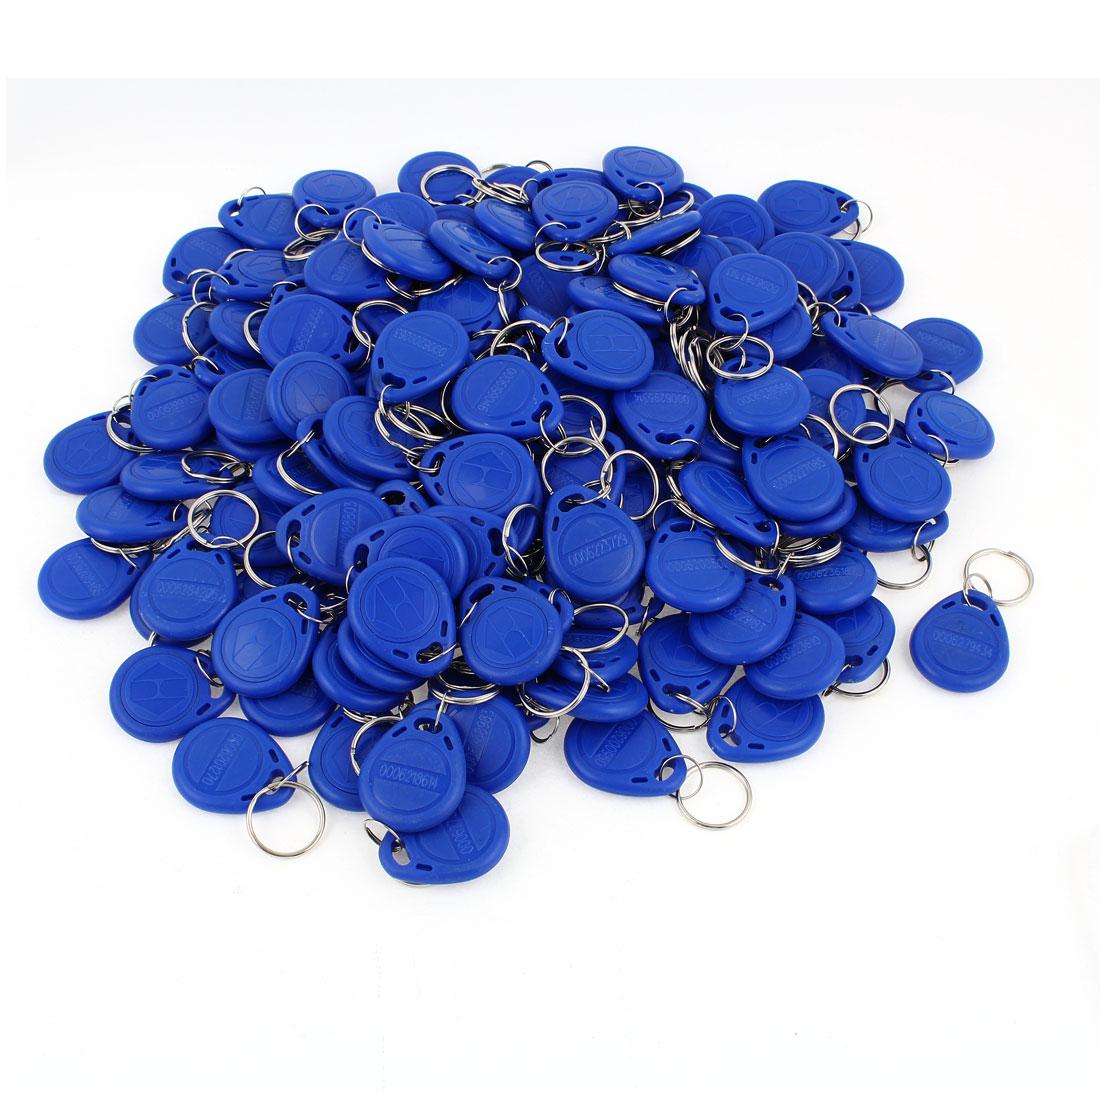 150pcs Blue RFID EM4100 125KHz Access Control ID Cards Tag Keyring Key Fobs